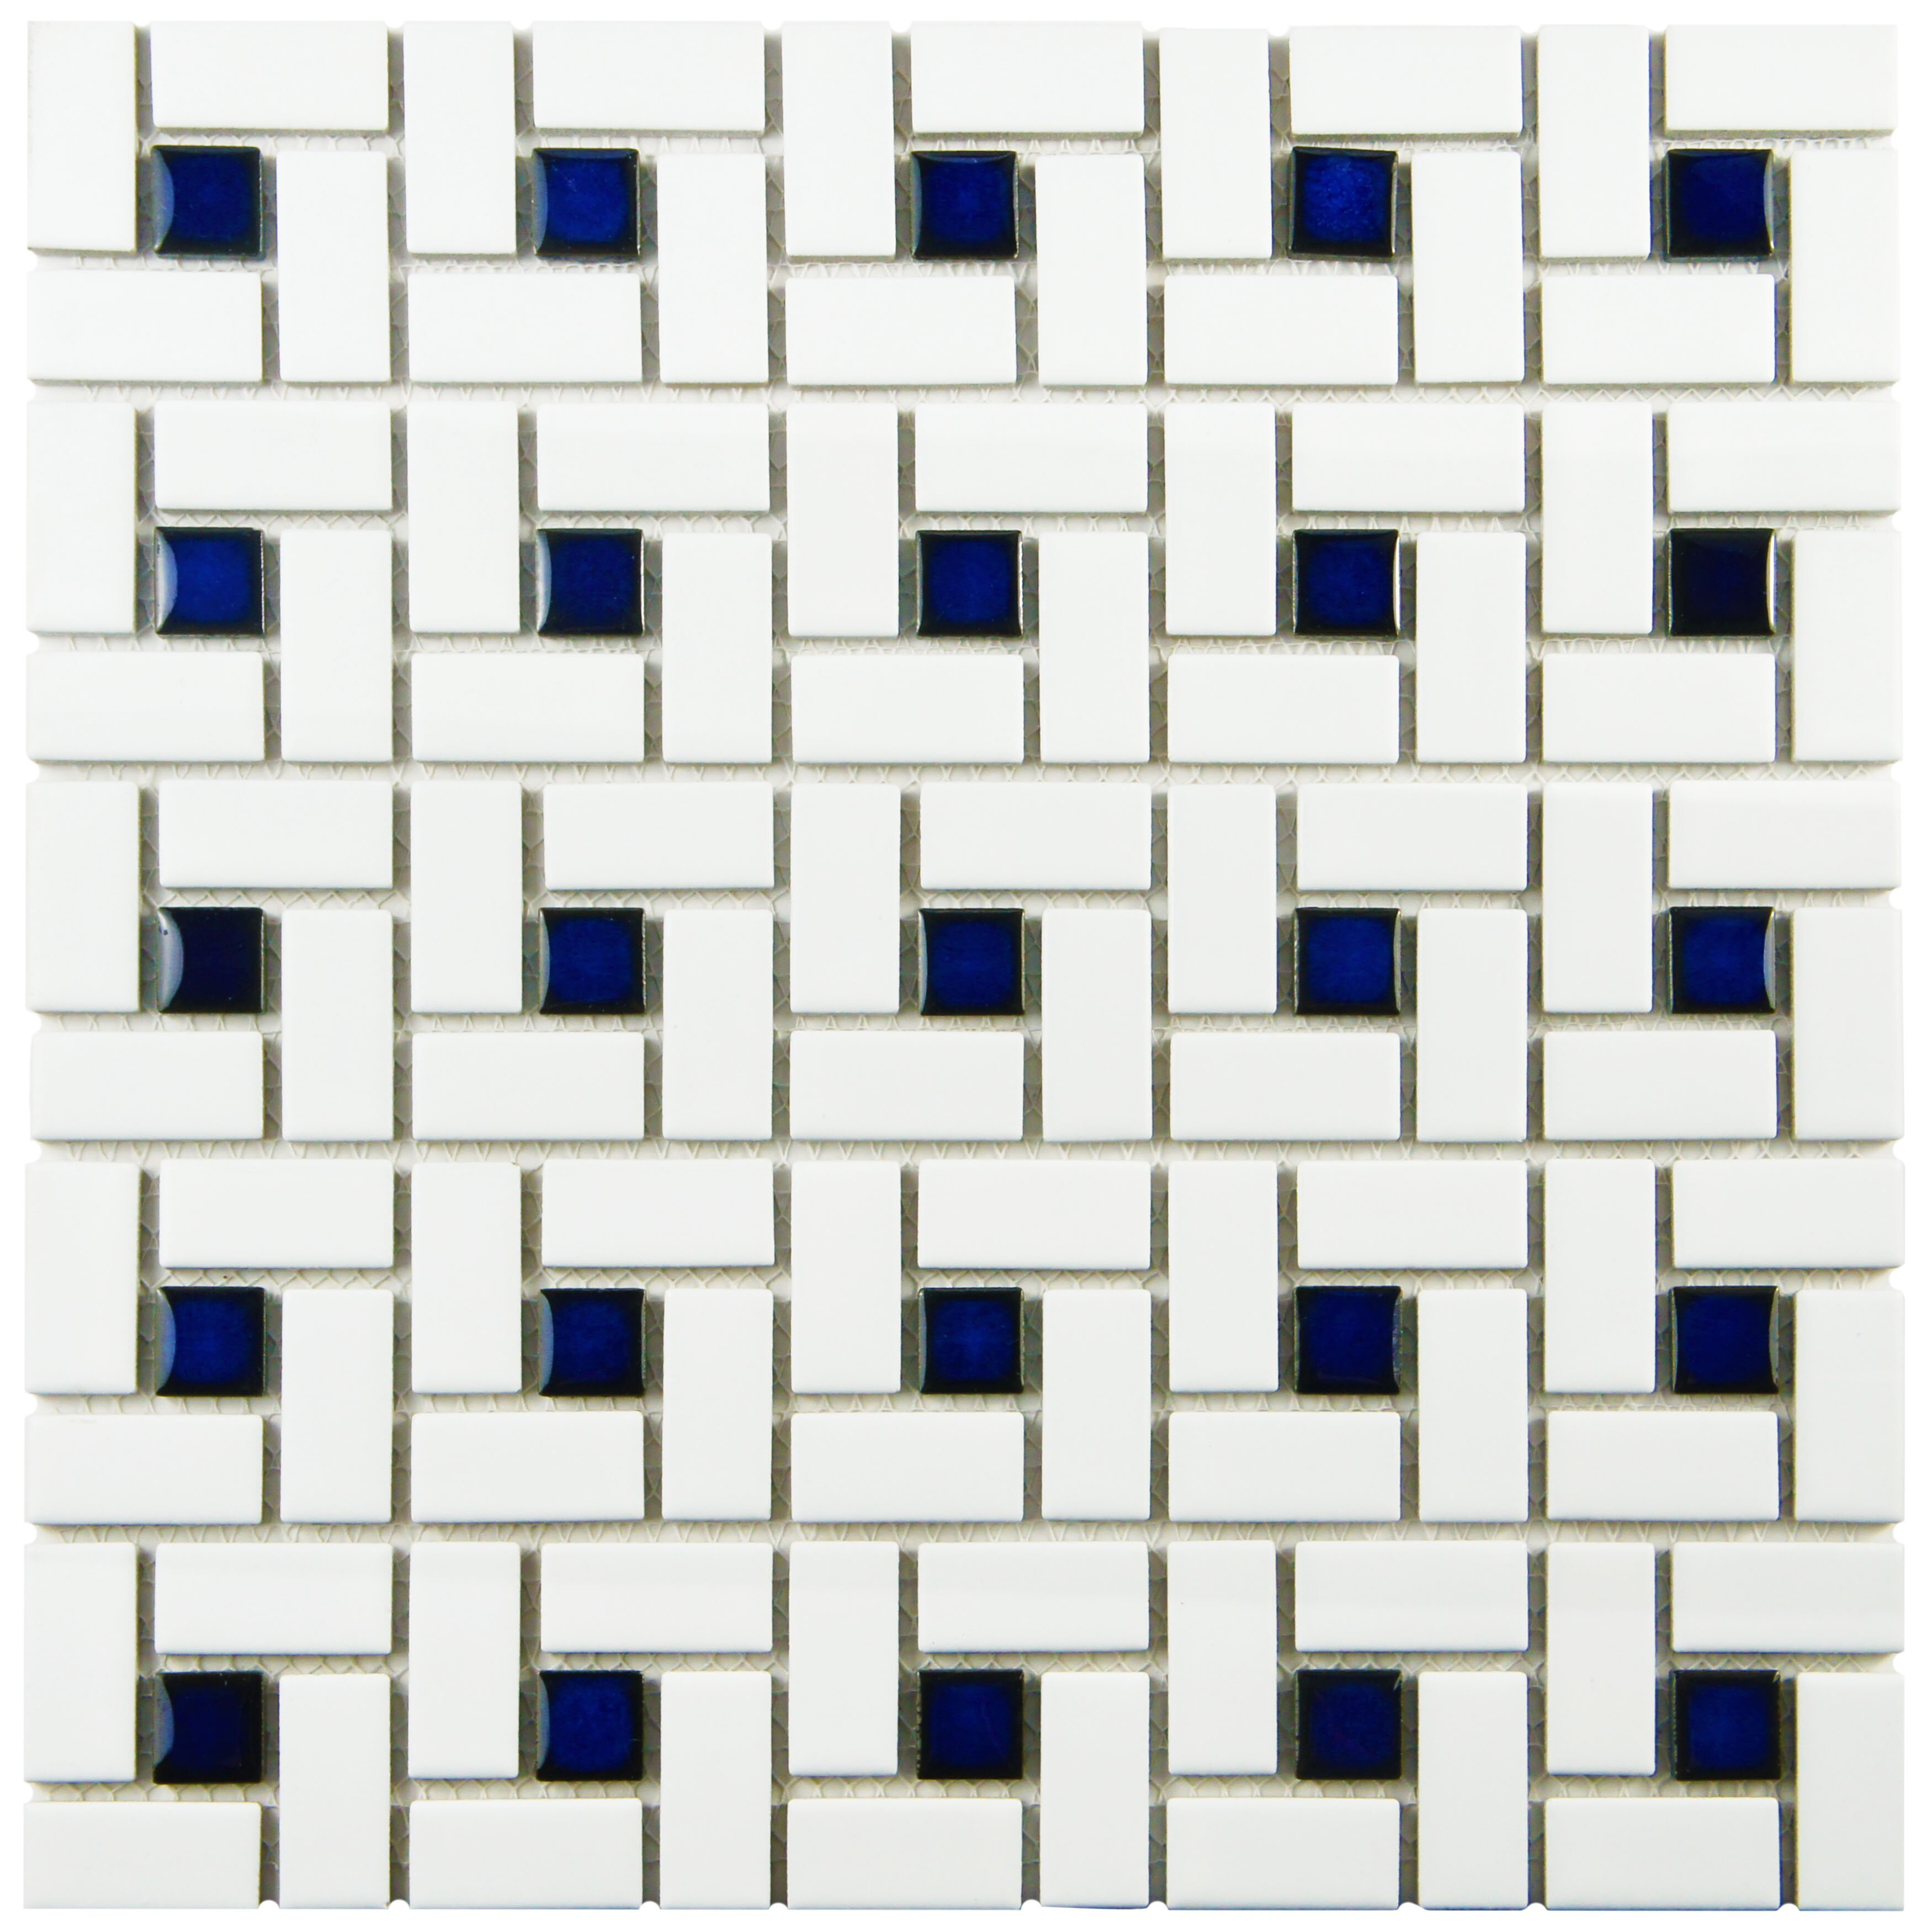 Elitetile retro 12 5 x 12 5 porcelain mosaic tile in for 12 x 12 blue ceramic floor tile